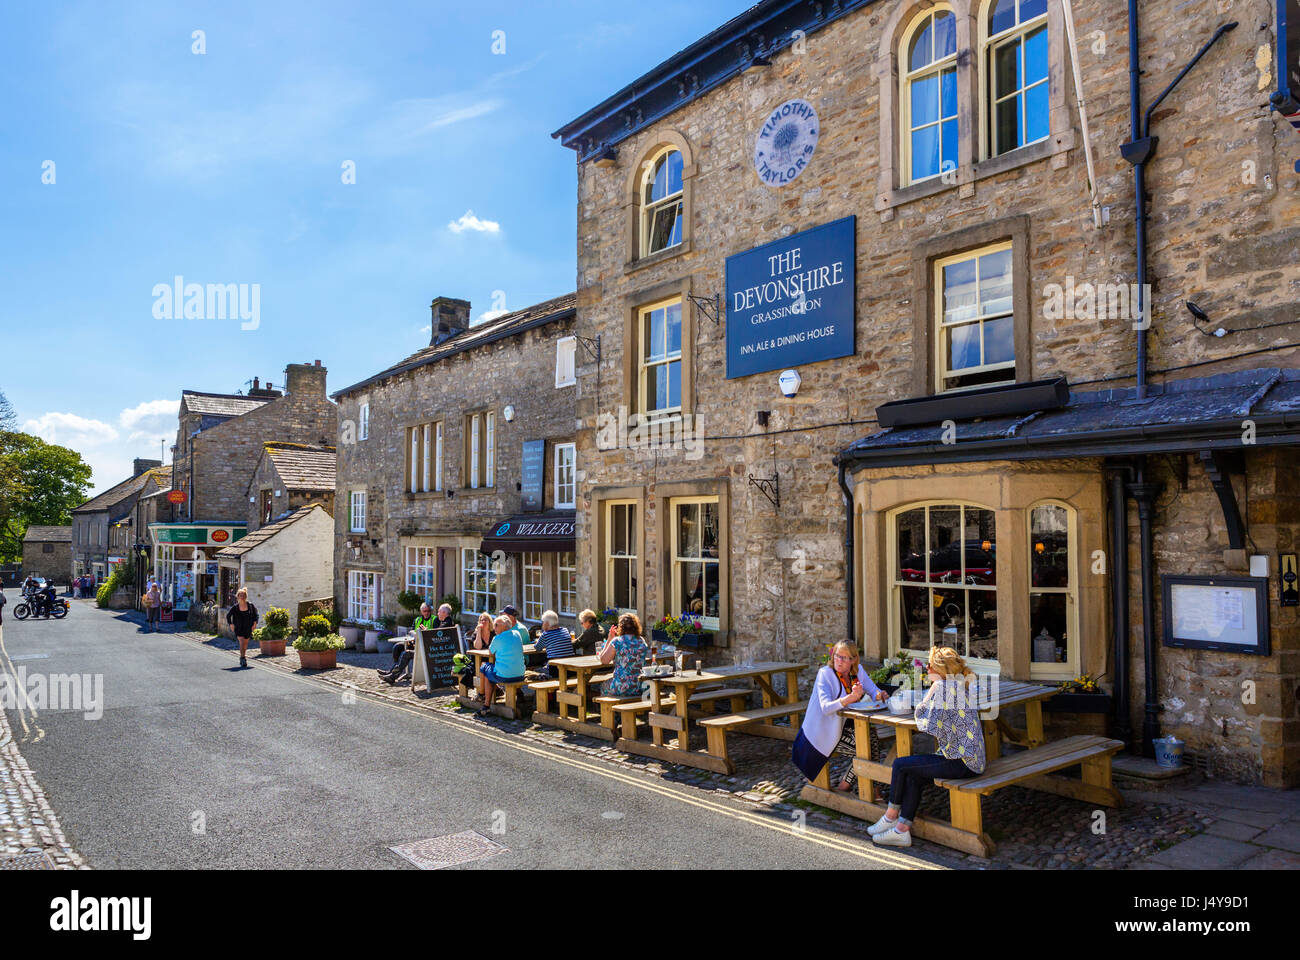 The Grassington Inn on The Square, Grassington, Wharfedale, Yorkshire Dales National Park, North Yorkshire, England, UK. Stock Photo